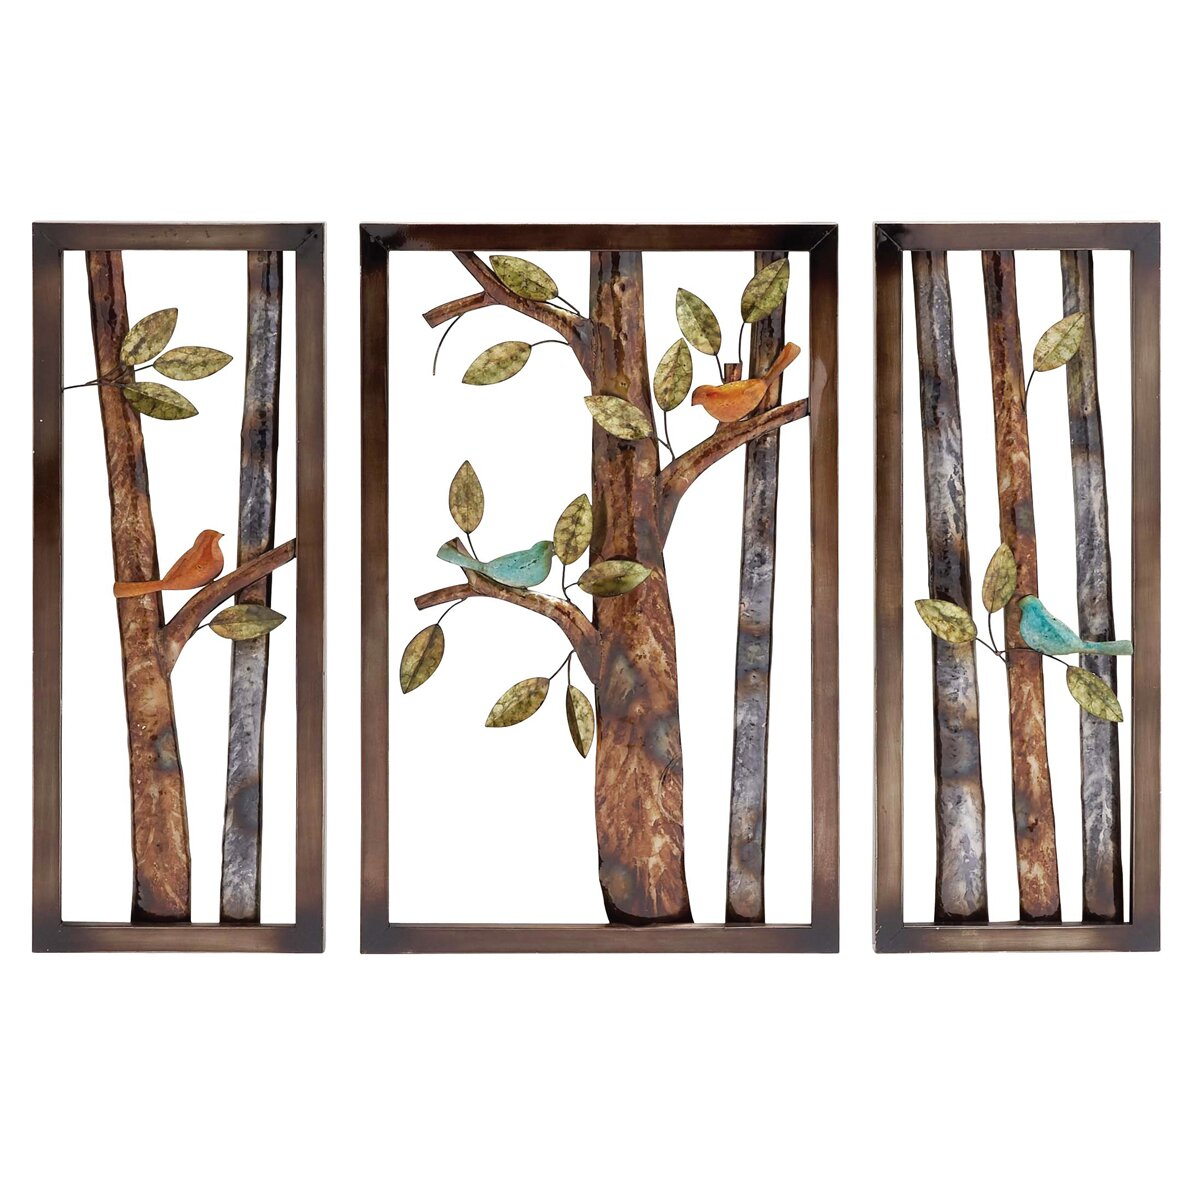 ec world imports 3 piece morning birds botanical wall. Black Bedroom Furniture Sets. Home Design Ideas